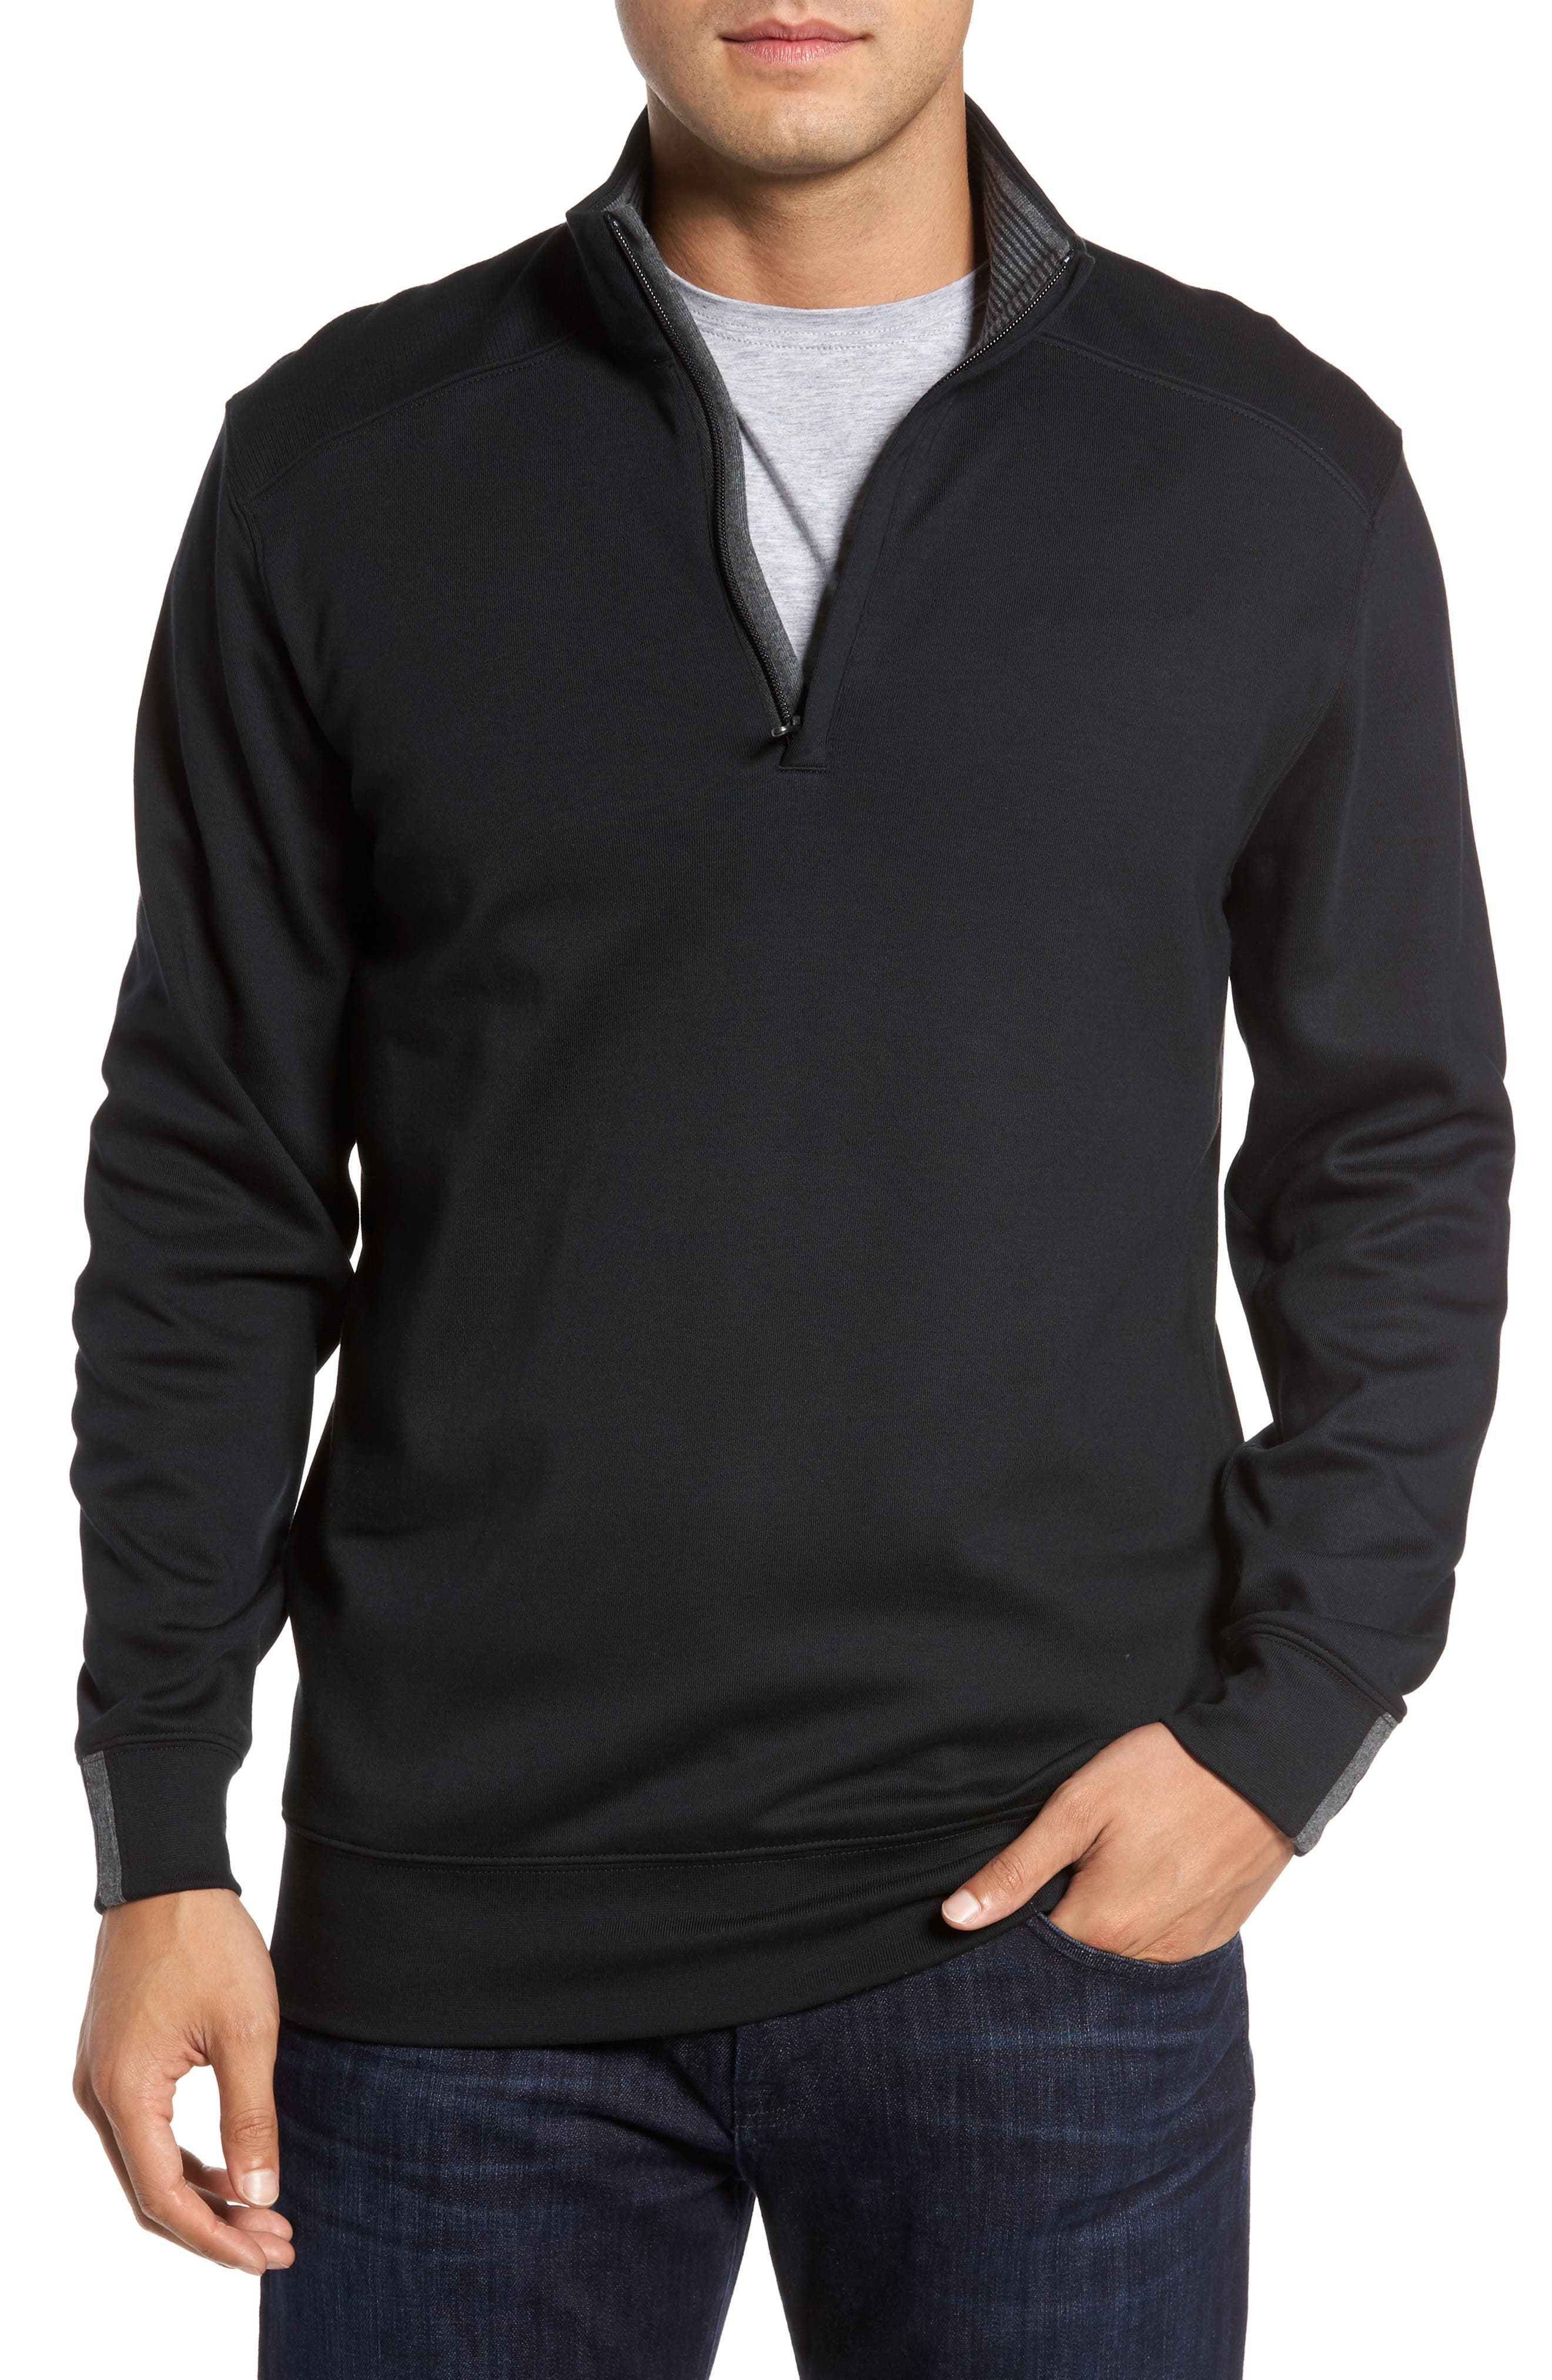 BOBBY JONES 'New Leaderboard' Quarter Zip Pullover, Main, color, BLACK